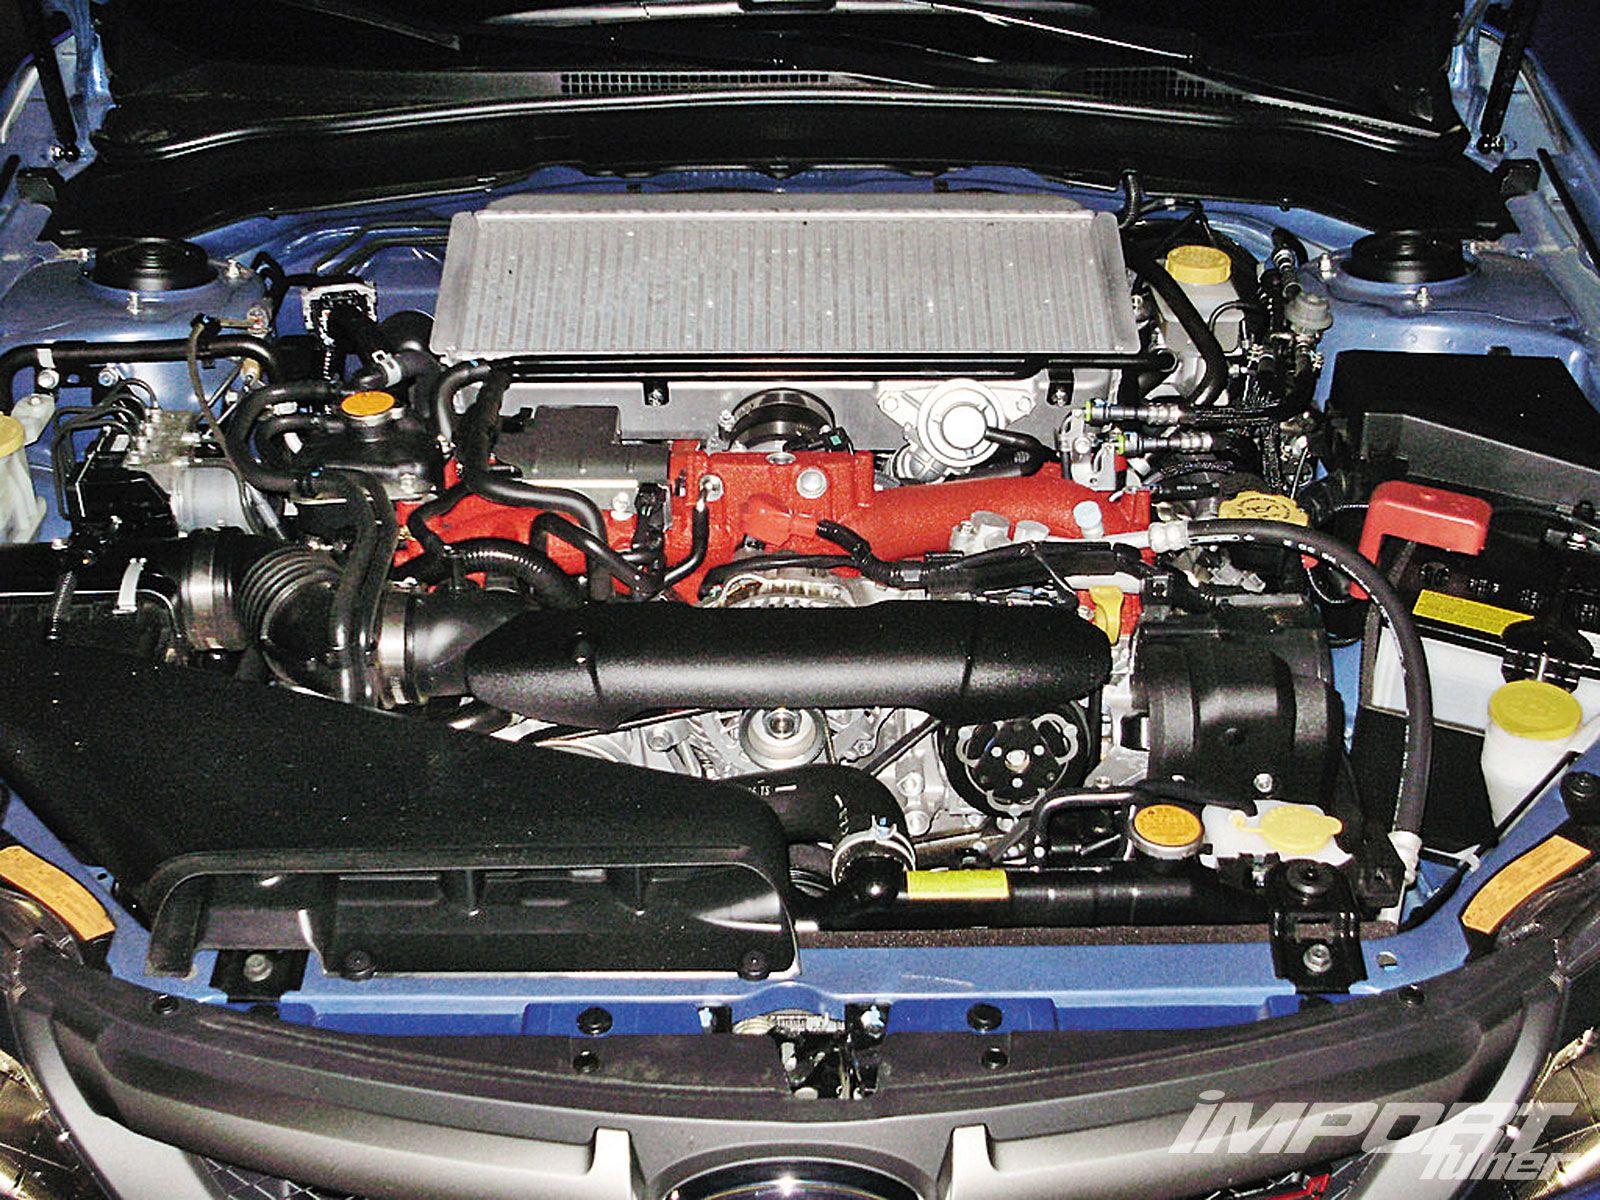 Subaru Impreza Wrx Sti El Mejor Auto De Rally Subaru Subaru Impreza Wrx Sti